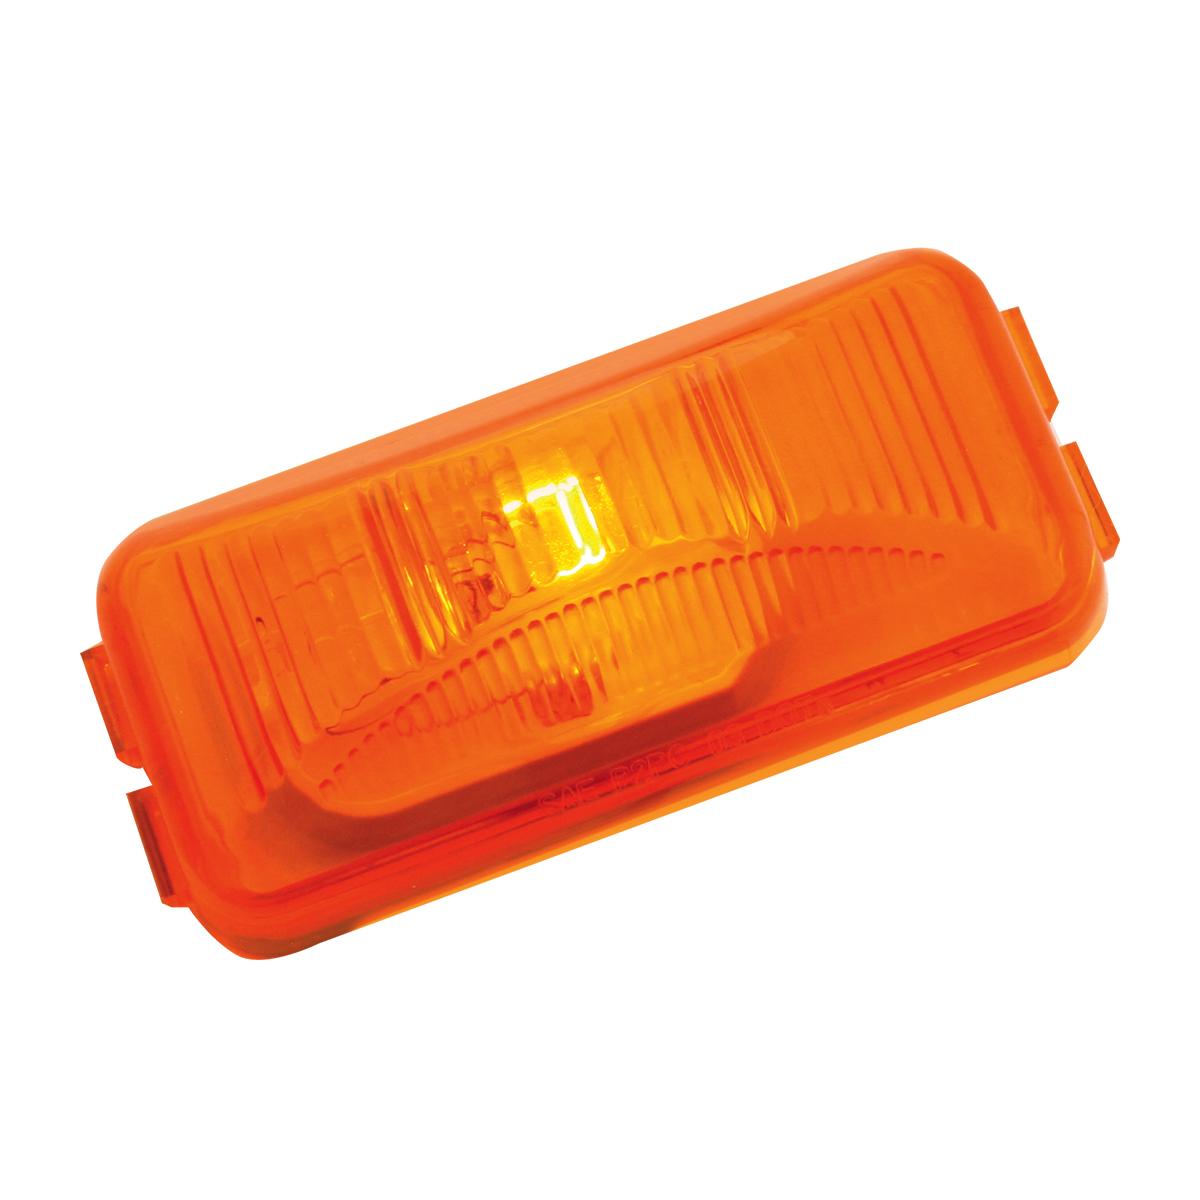 80275 Small Rectangular Single Bulb Sealed Marker & Clearance Light